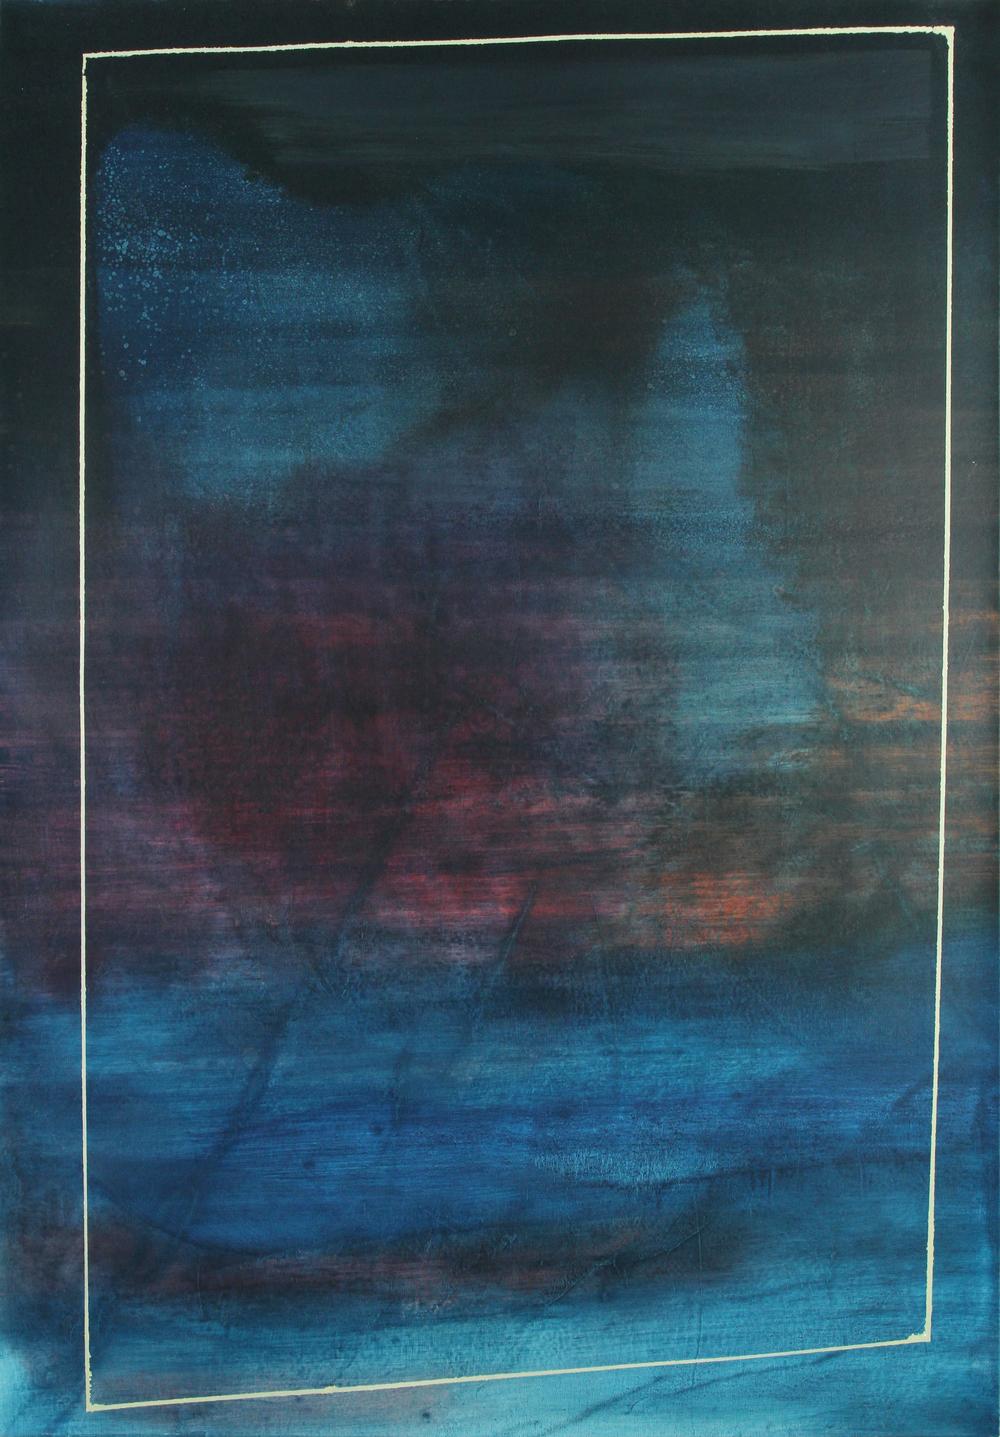 indigo, 2013, oil on canvas, 54 x 37.5 in